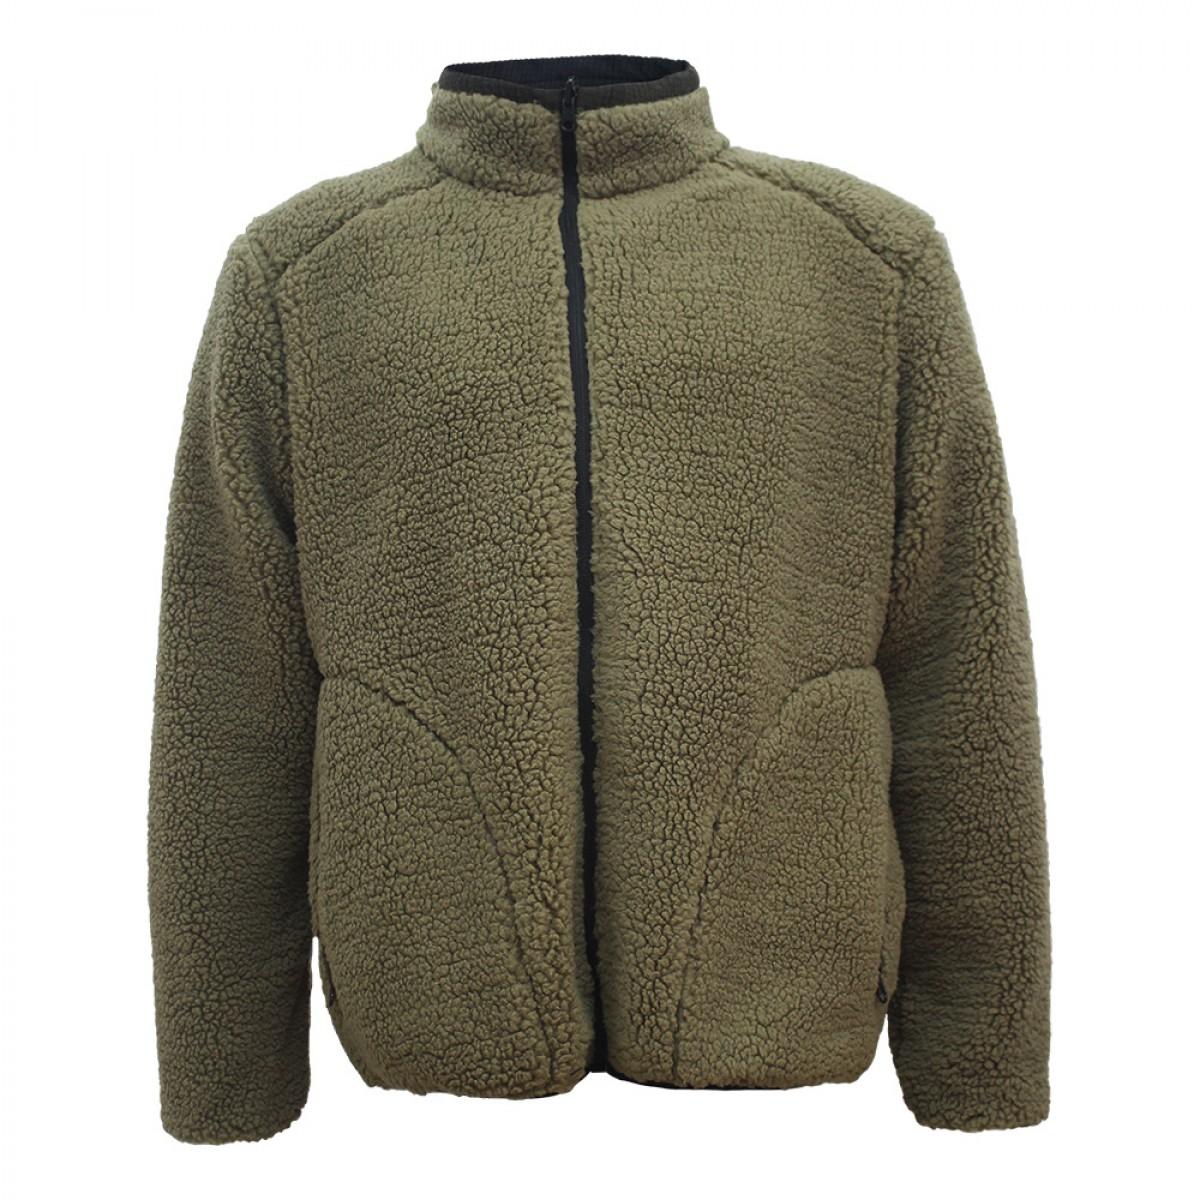 men-thick-sheep-jacketksj05922-6a